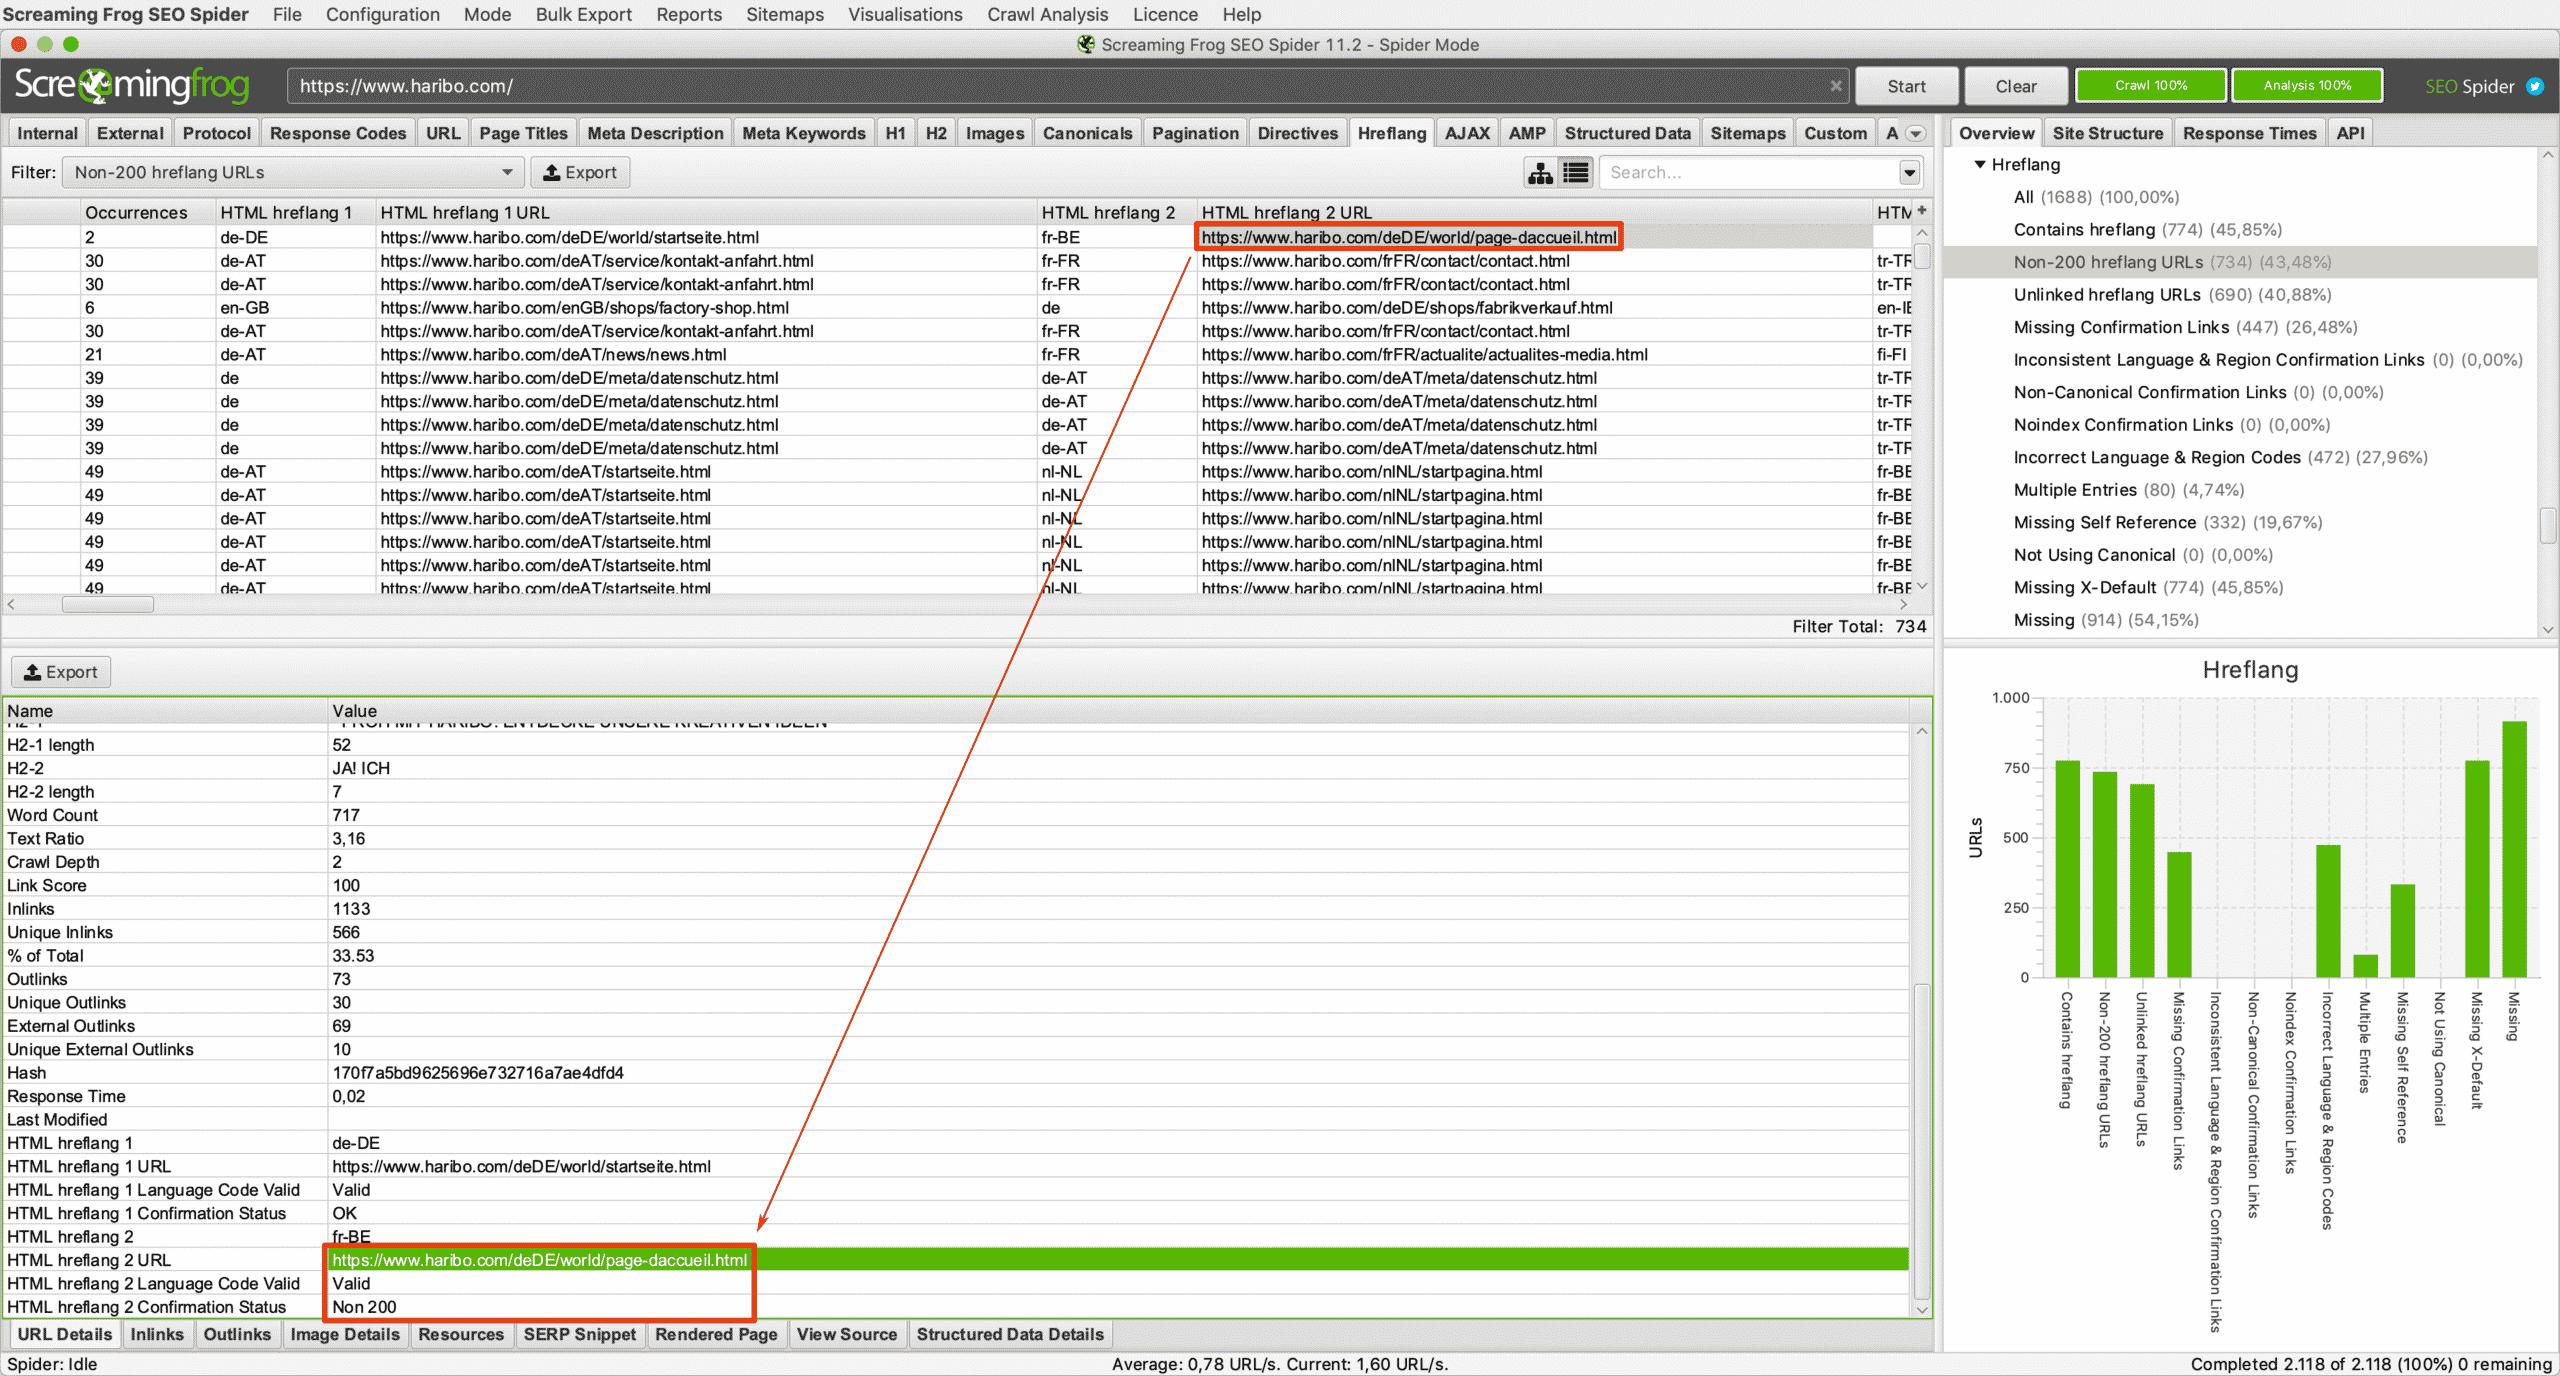 Non-200 hreflang URLs